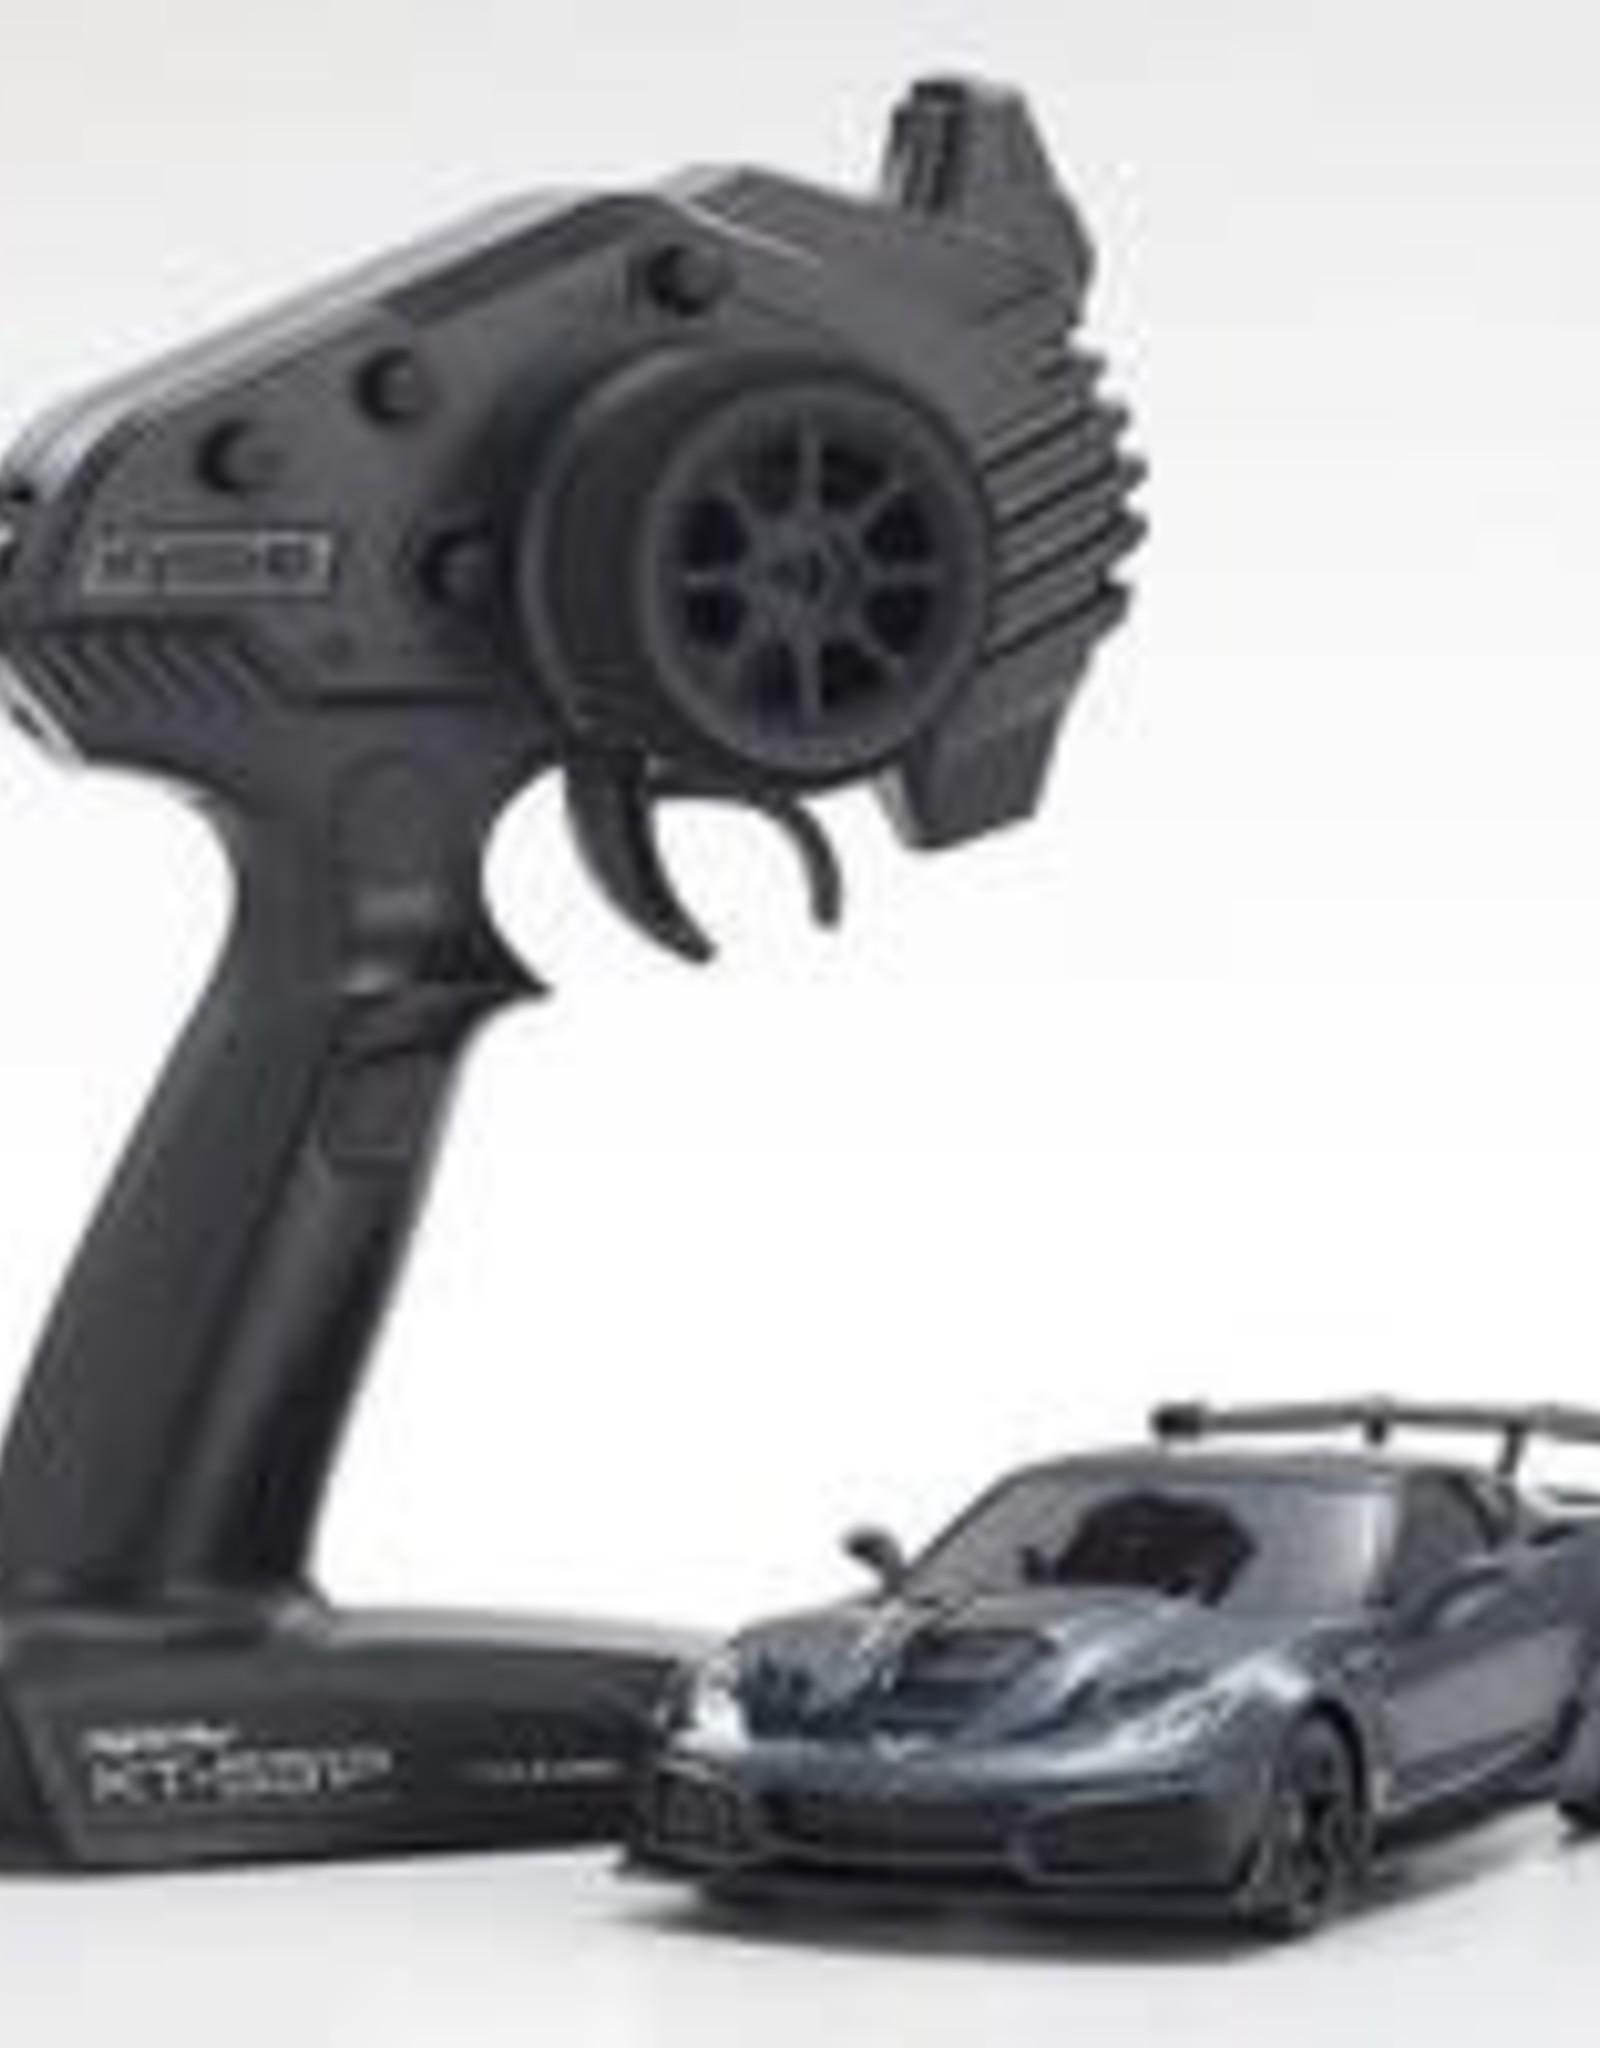 kyosho MINI-Z MR-03 RWD Corvette ZR1 Readyset, Gray Metallic w/LED Lights, Readyset